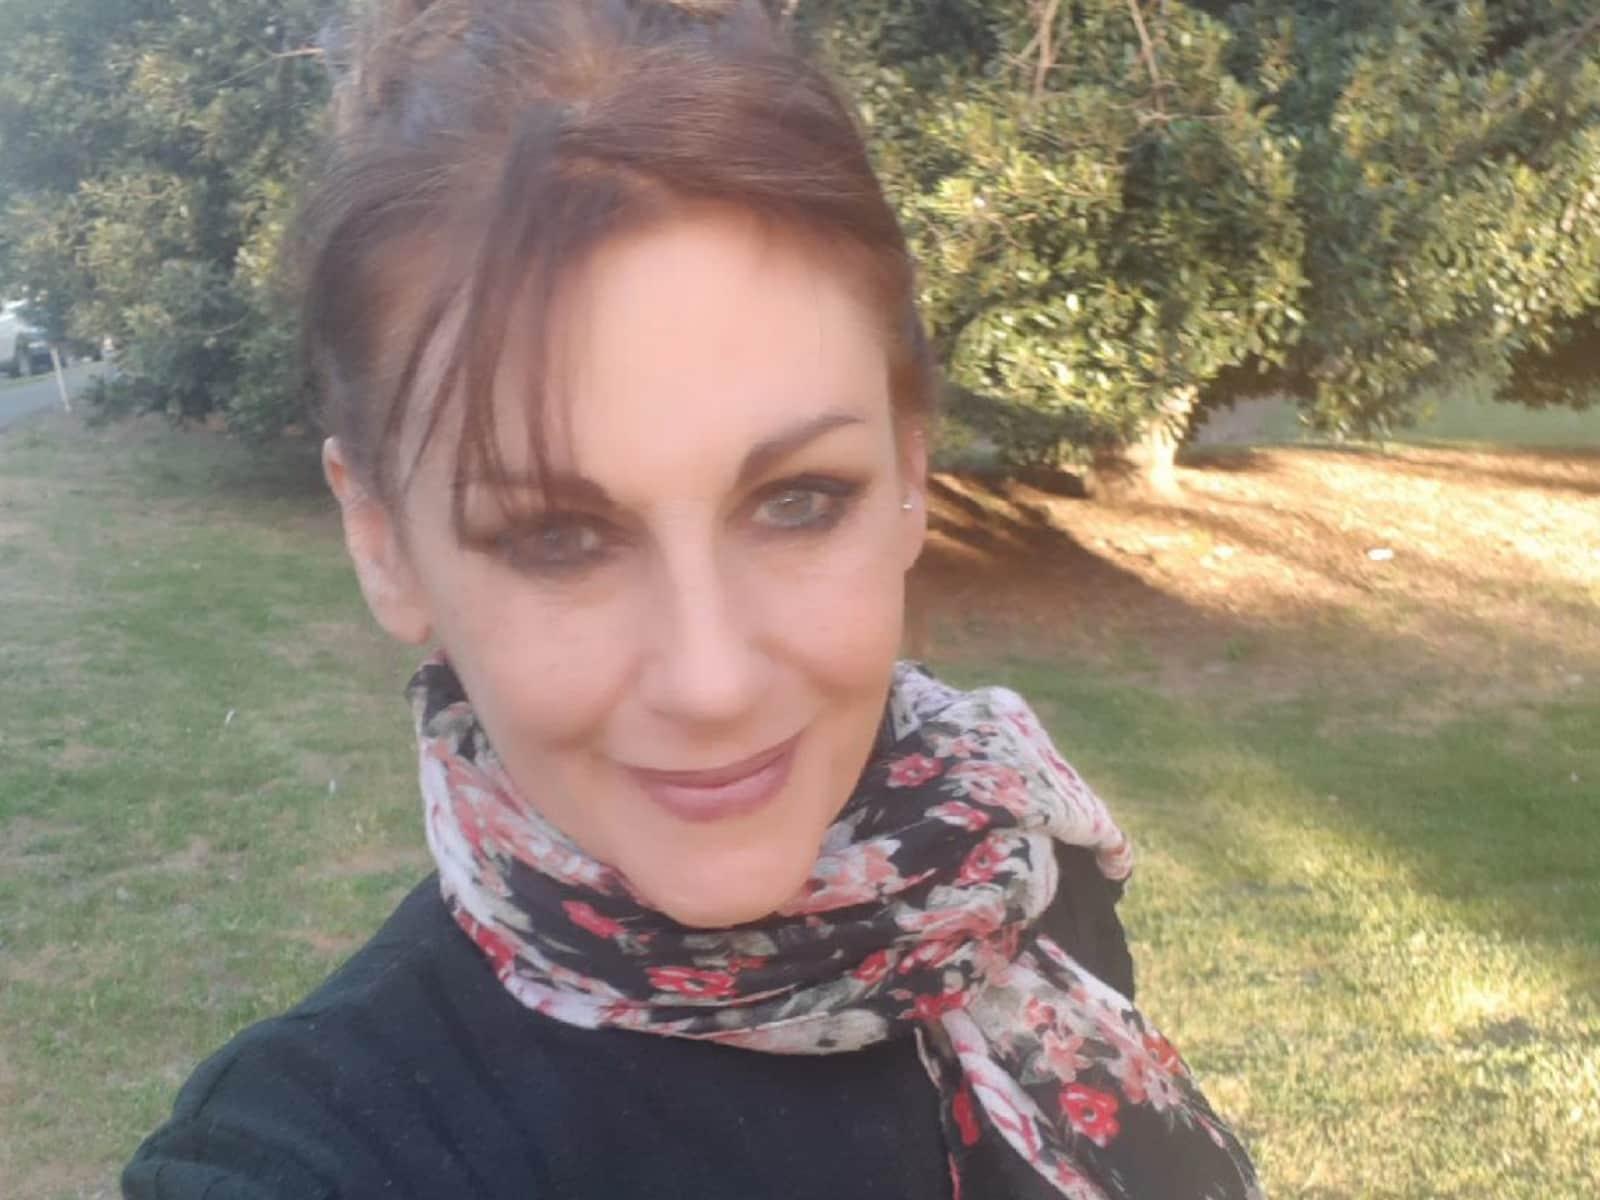 Maxine from Adelaide, South Australia, Australia